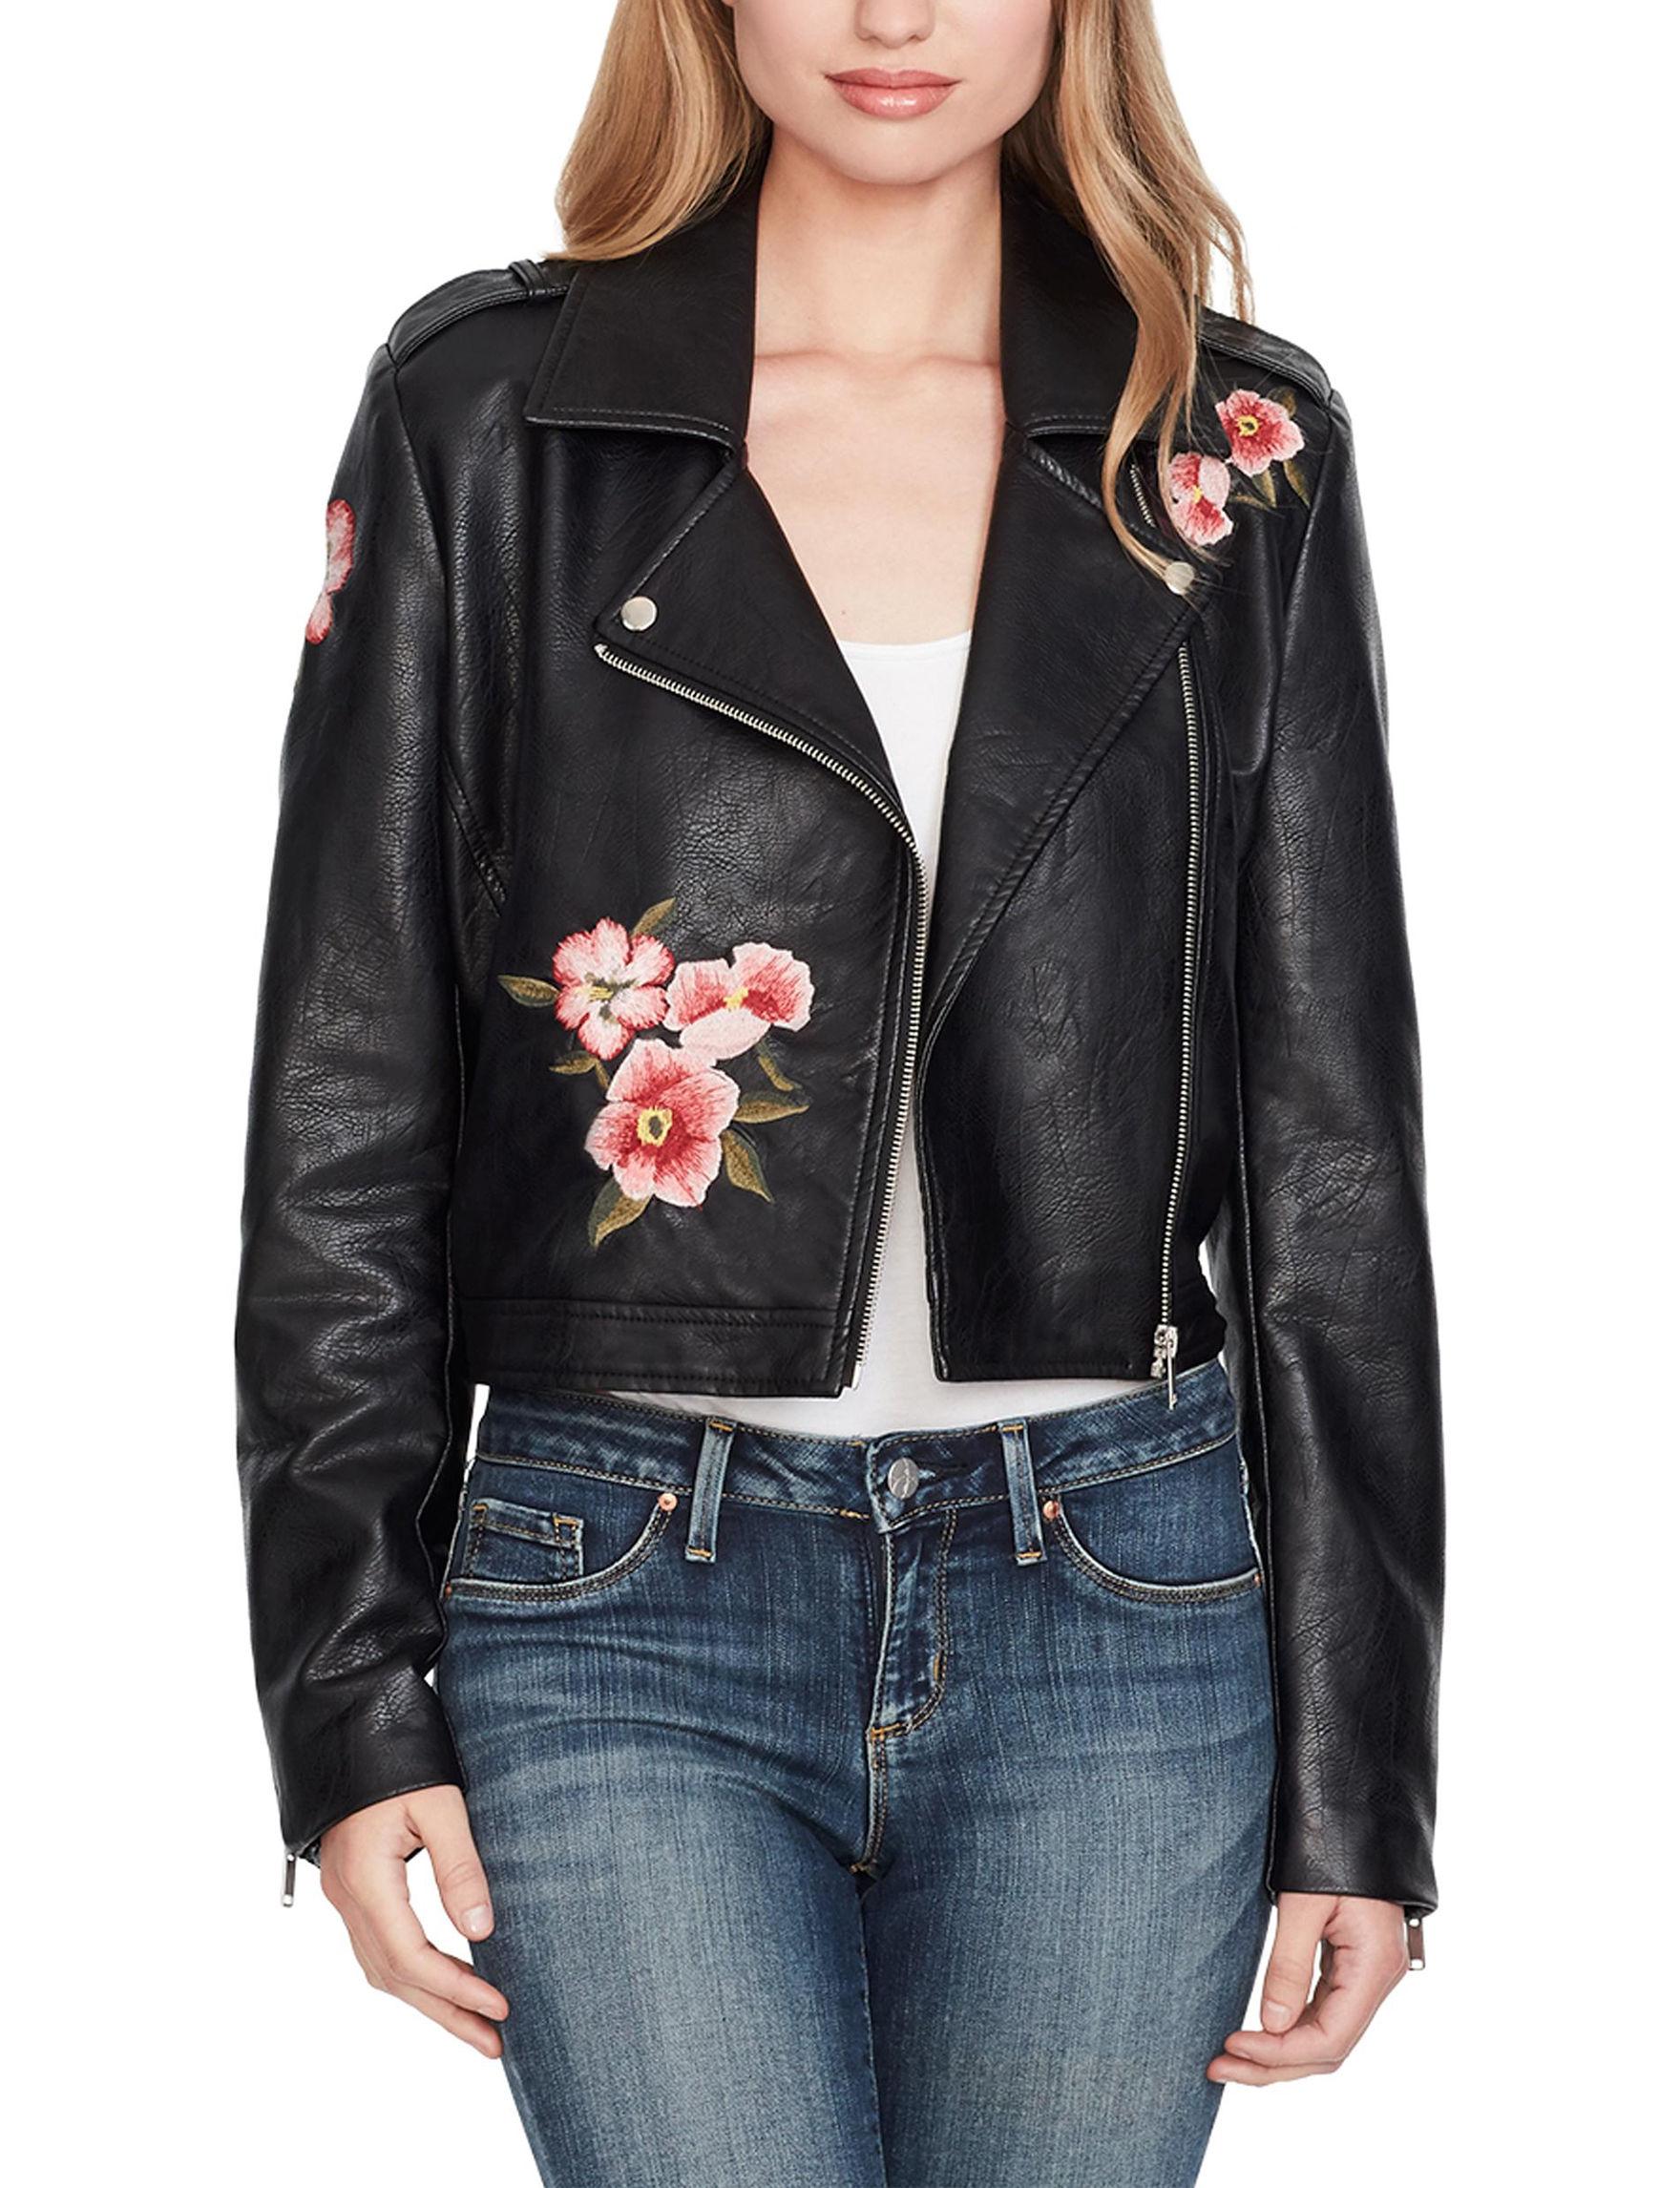 Jessica Simpson Black Lightweight Jackets & Blazers